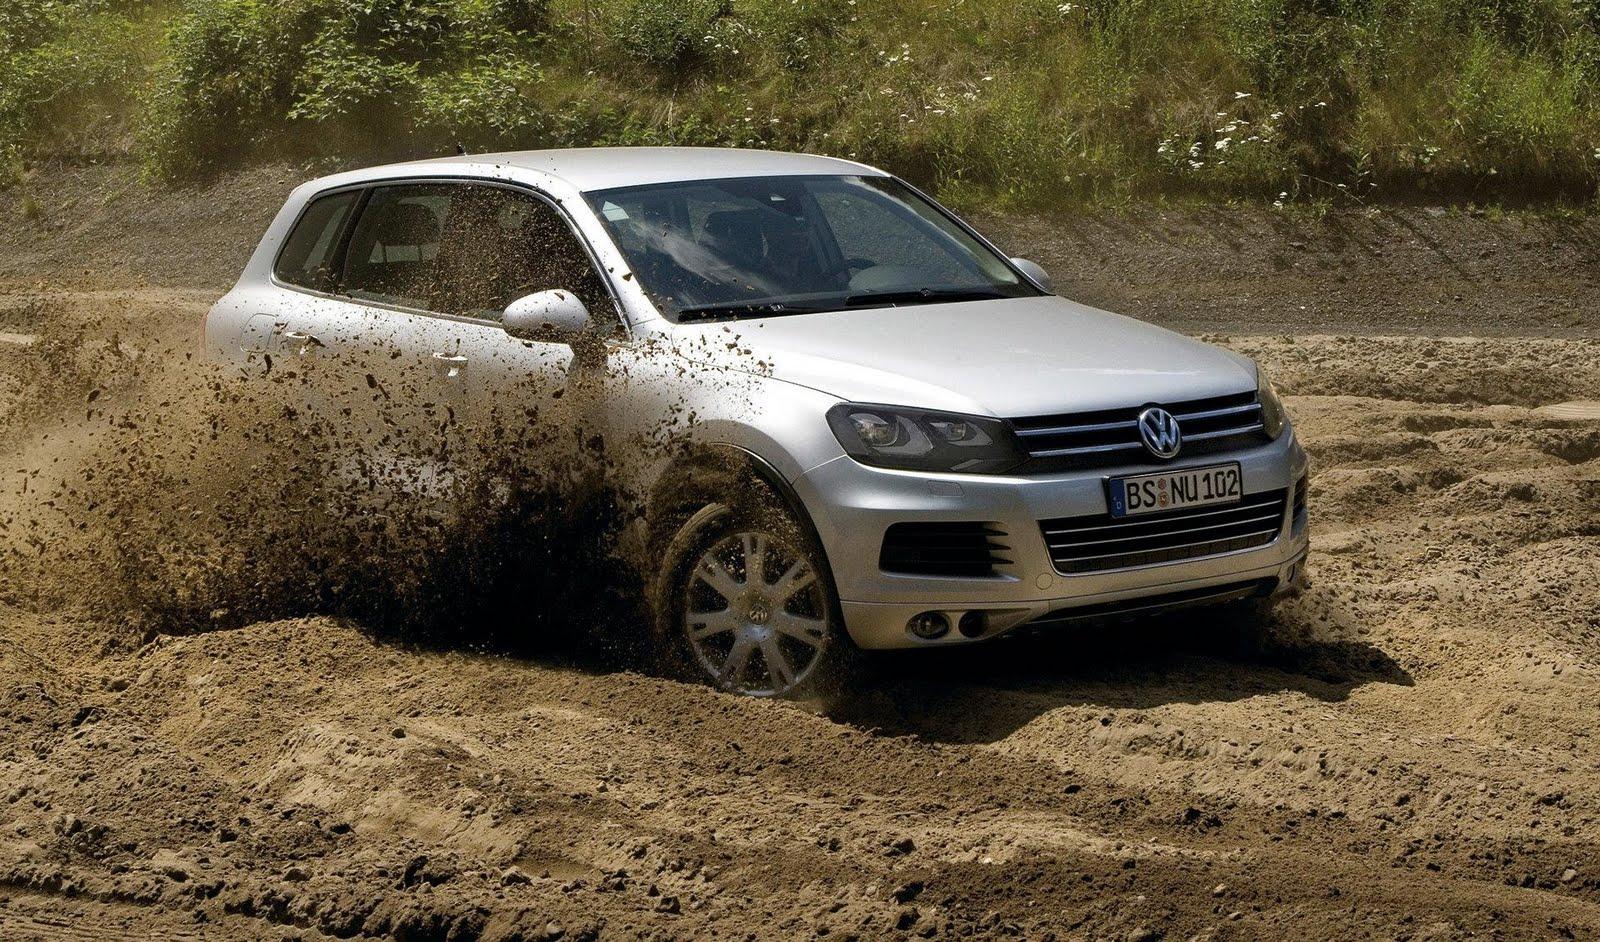 http://1.bp.blogspot.com/_7LQxj656qB0/TBkBE1BincI/AAAAAAAAHYU/p2_lb4ON_gs/s1600/2011+Volkswagen+Touareg+1.jpg